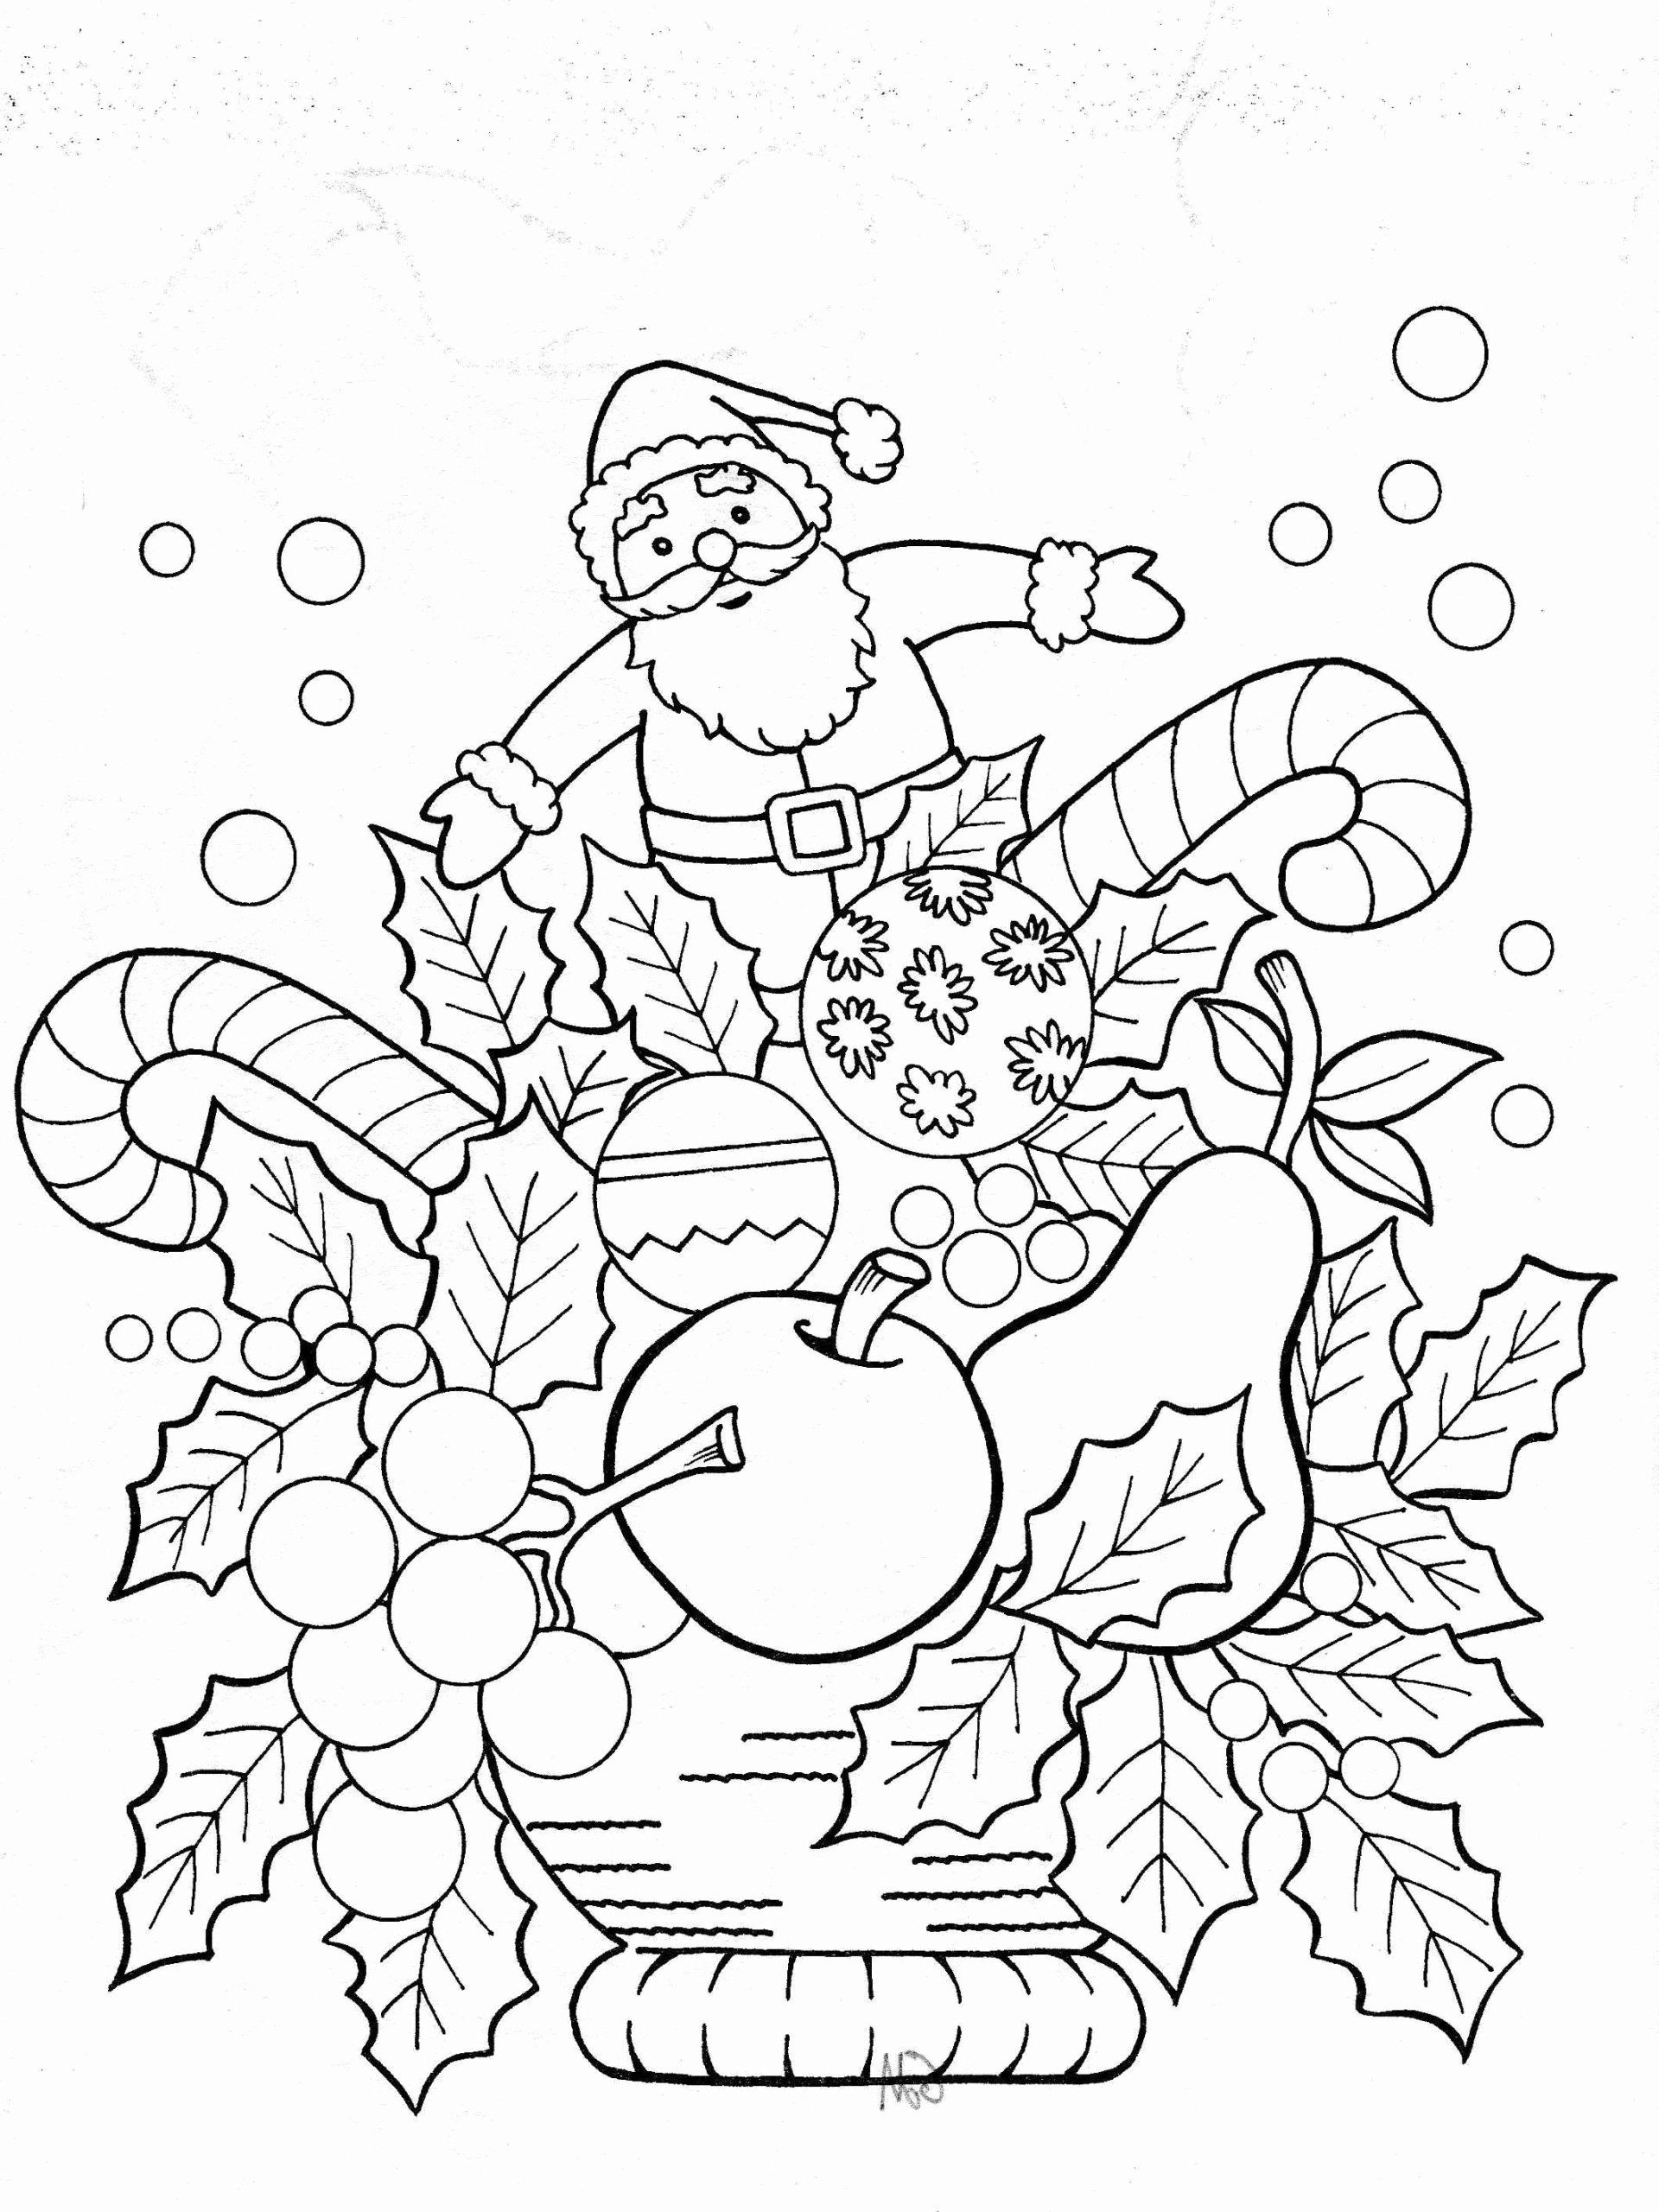 24 Marvelous Image Of Stocking Coloring Page Davemelillo Com Christmas Coloring Sheets Printable Christmas Stocking Christmas Stocking Template